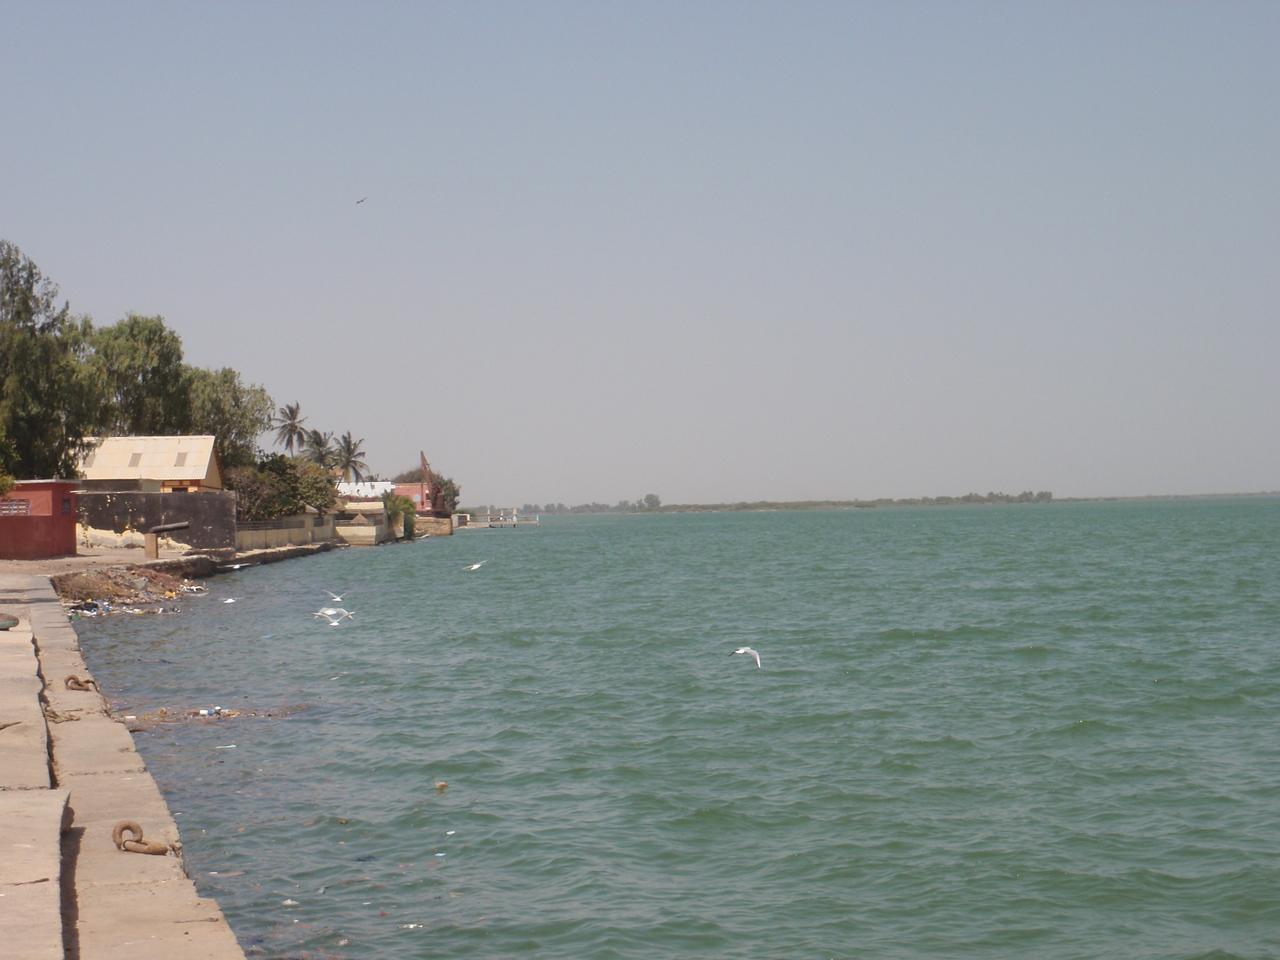 085_Senegal River  Border of Mauritania is a few km away